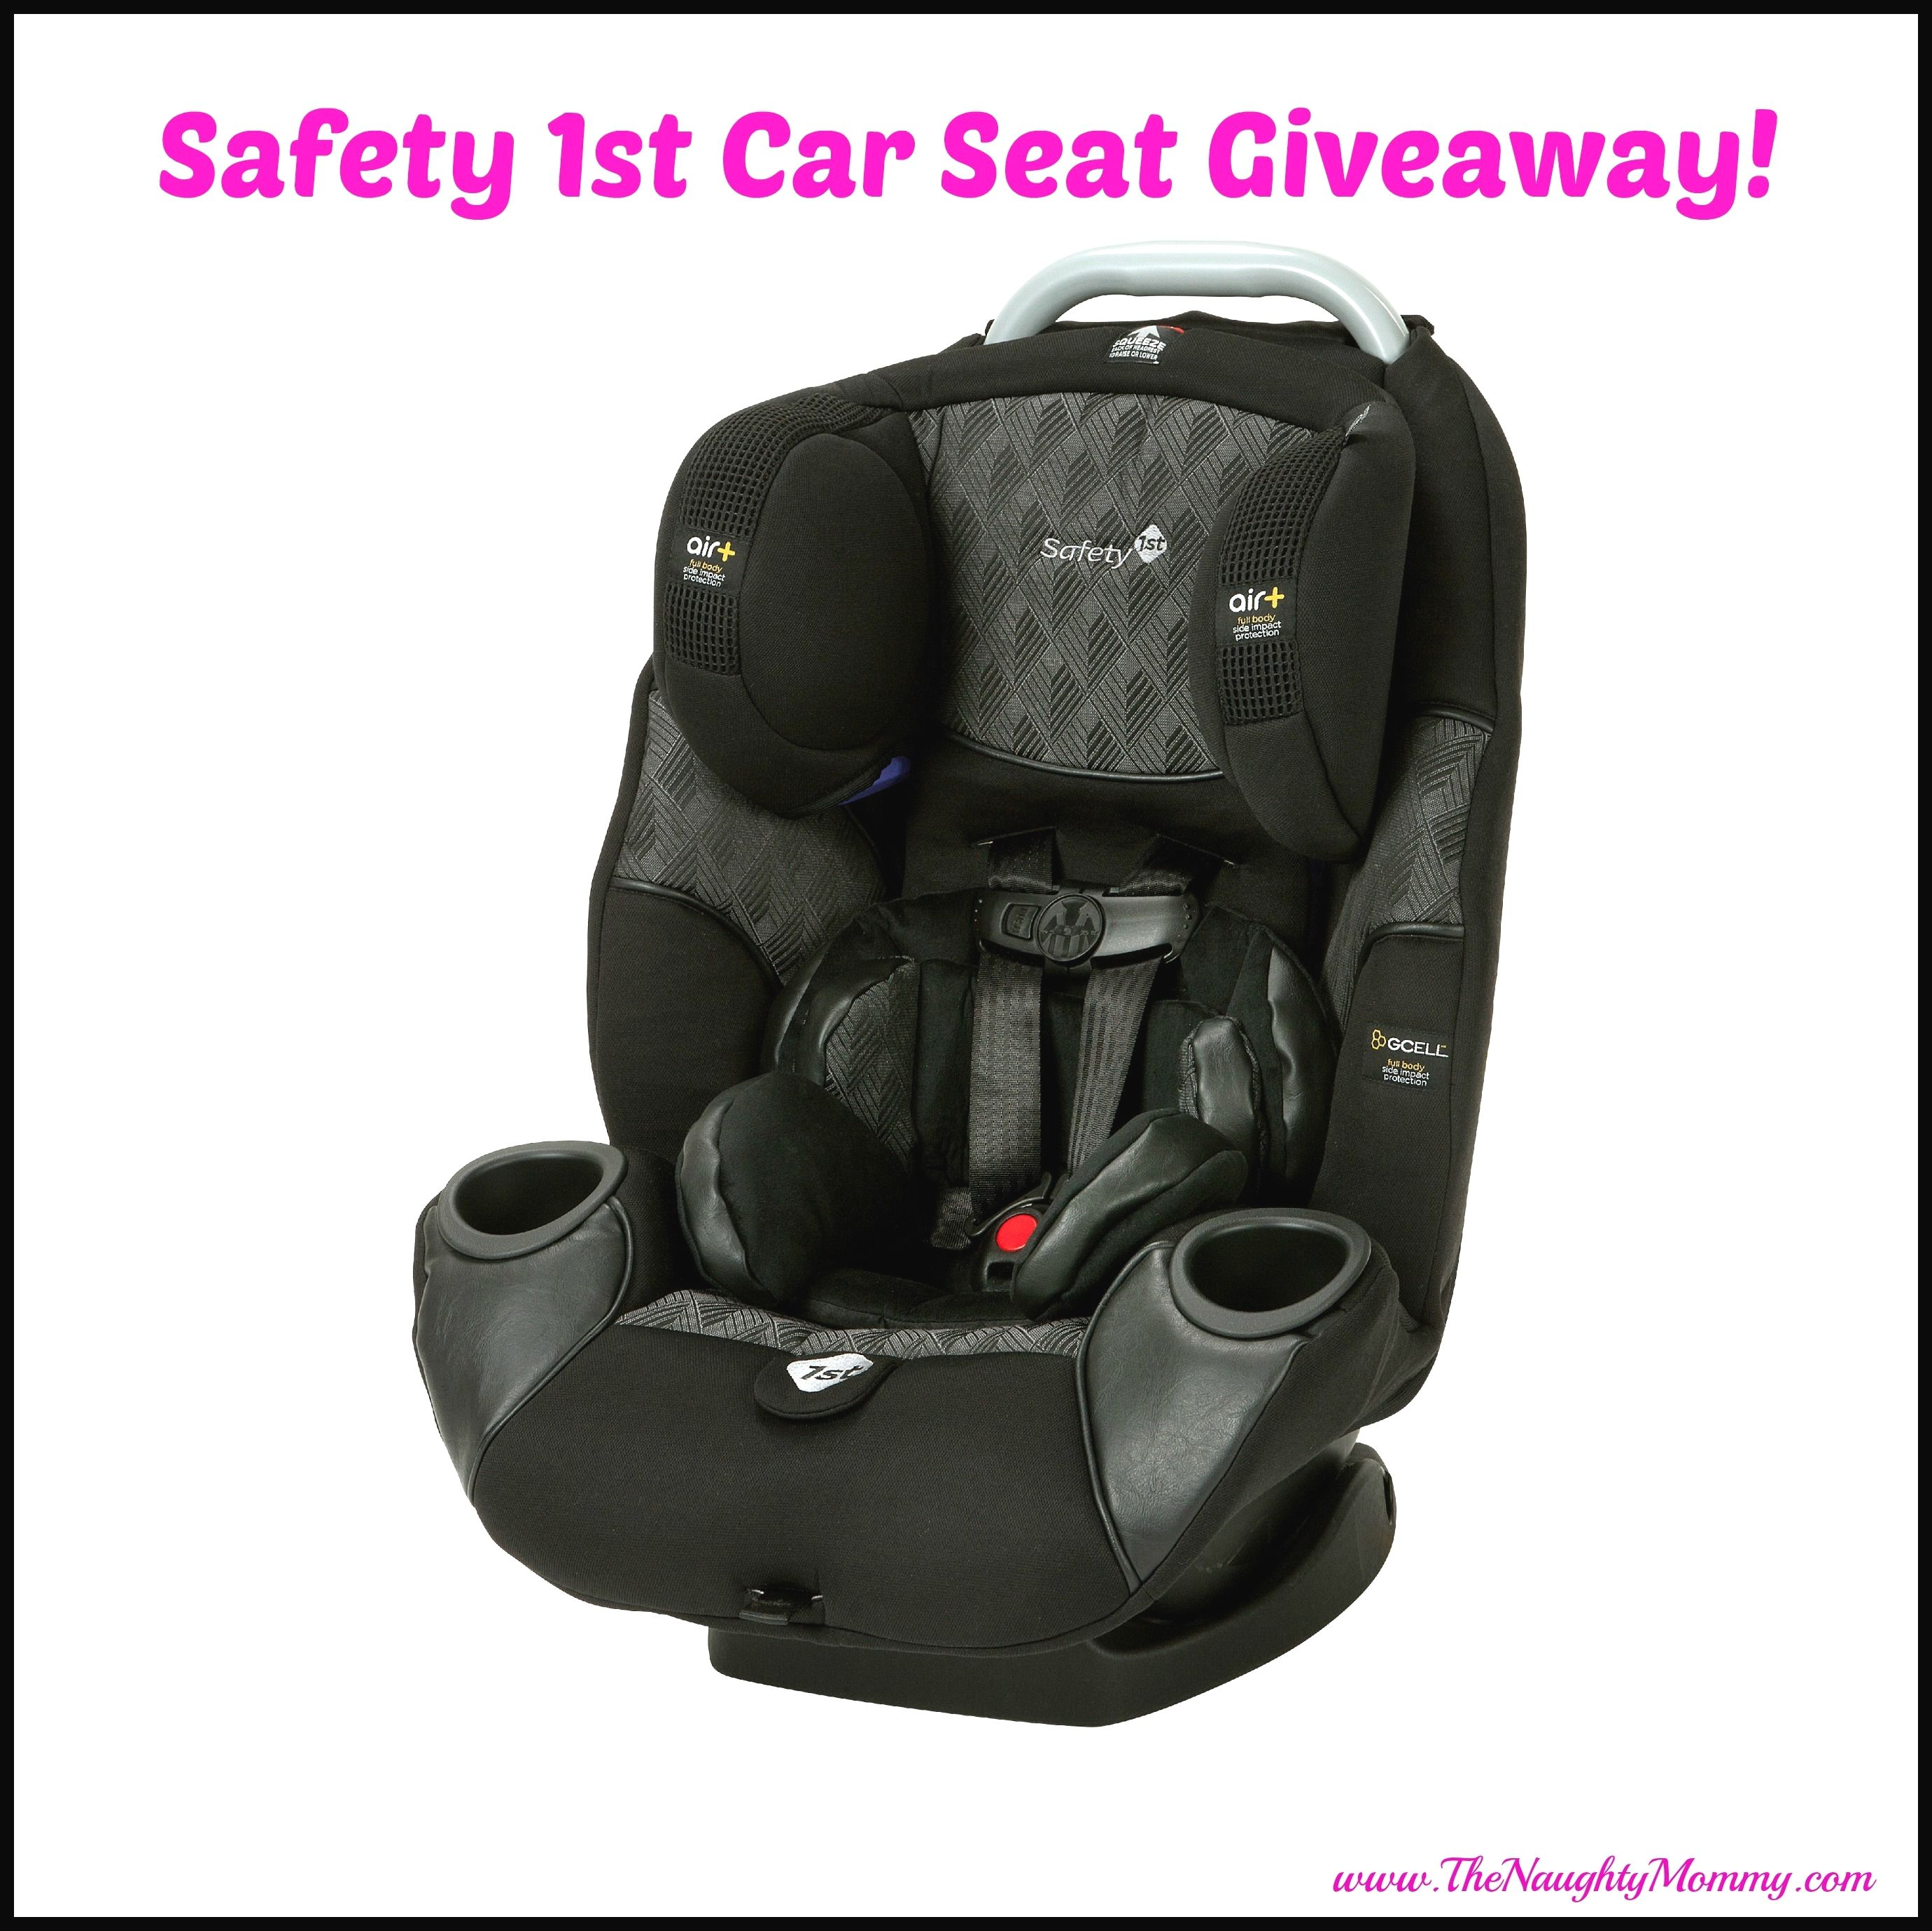 Baby Car Seatsbaby Seat Reviewsconvertible Seatsbest Seatsinfant Reviewscobritax Seats Topstrollers